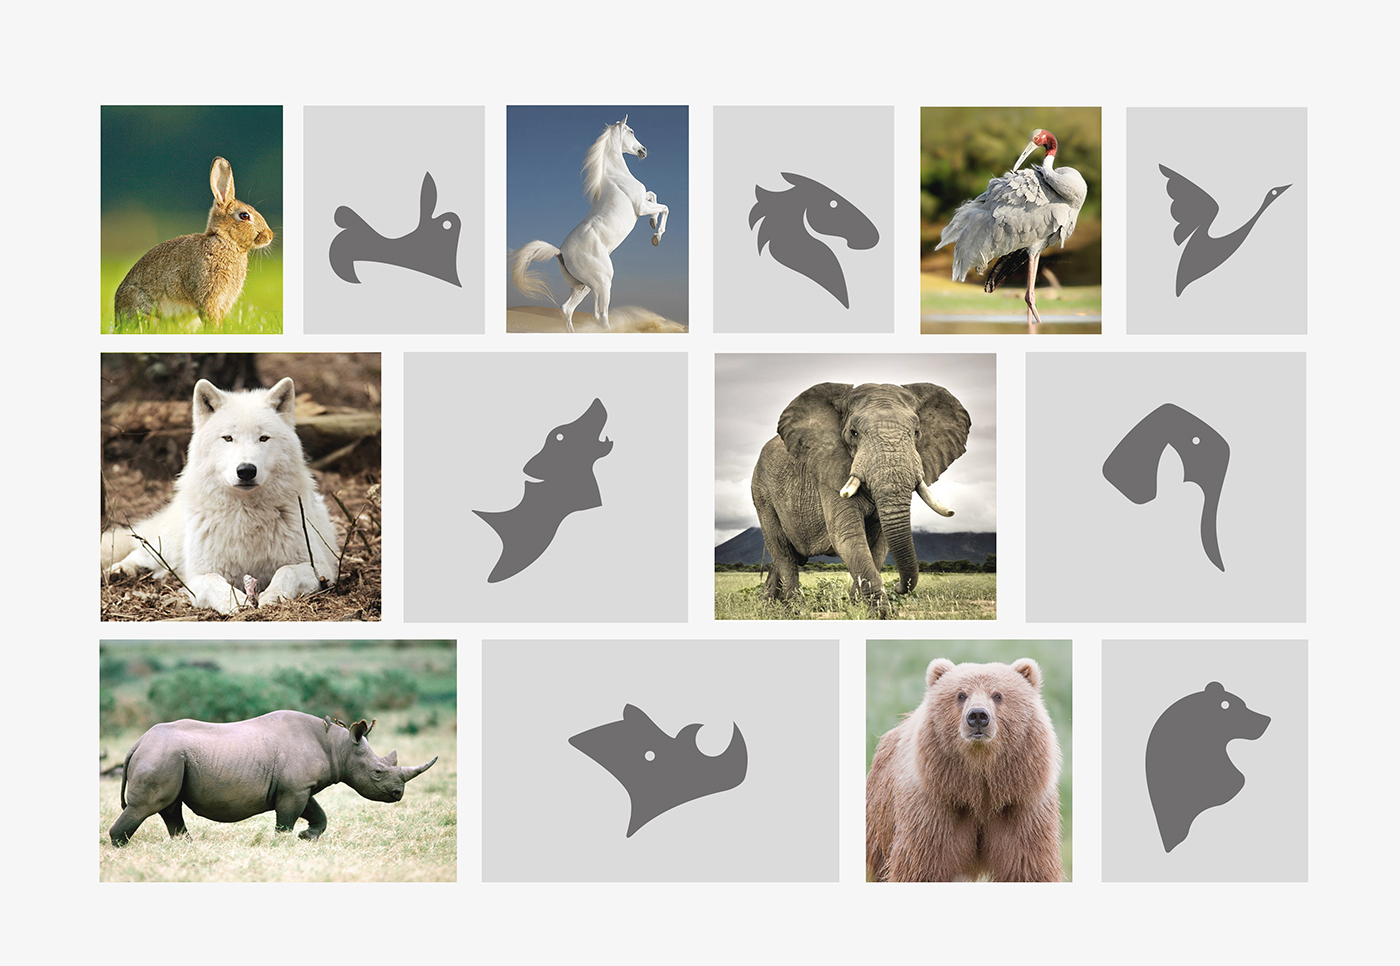 Animals symbol-bratus-zoo brand identity-vietnam design agency